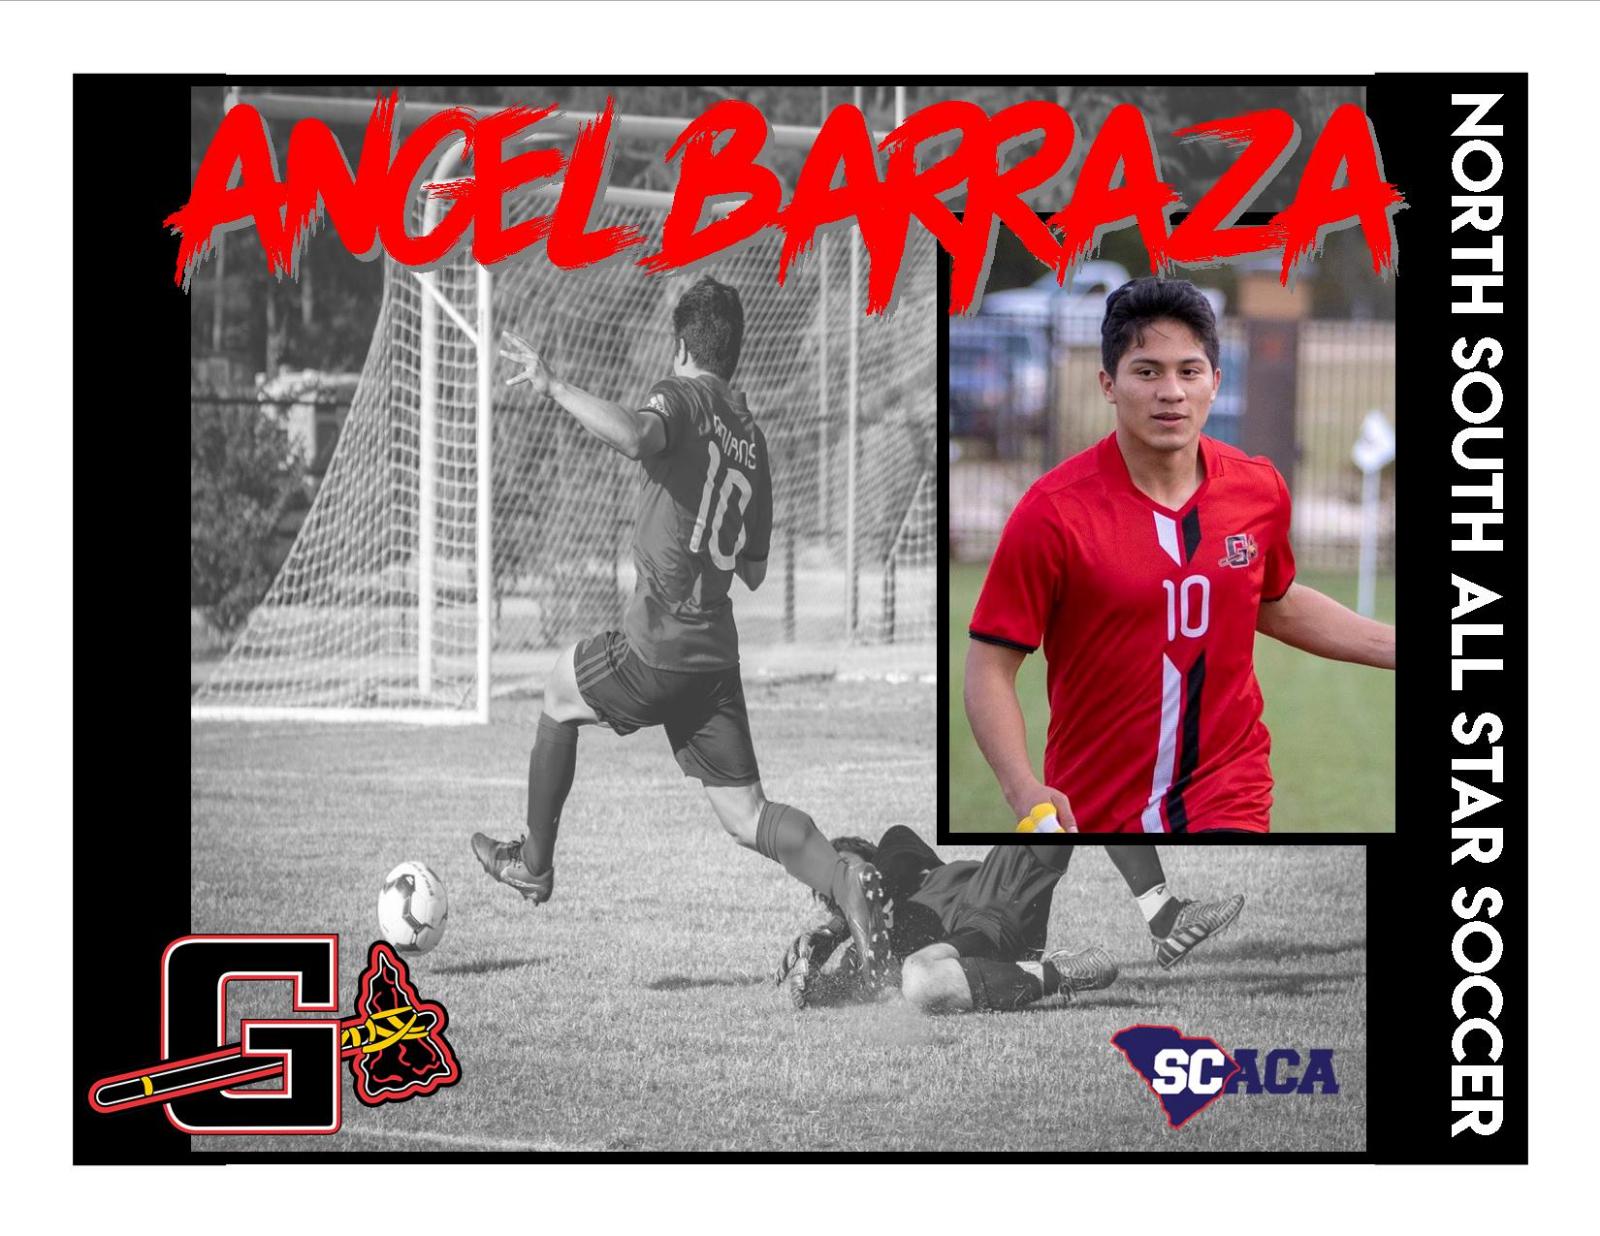 Angel Barraza North South Boys Soccer!